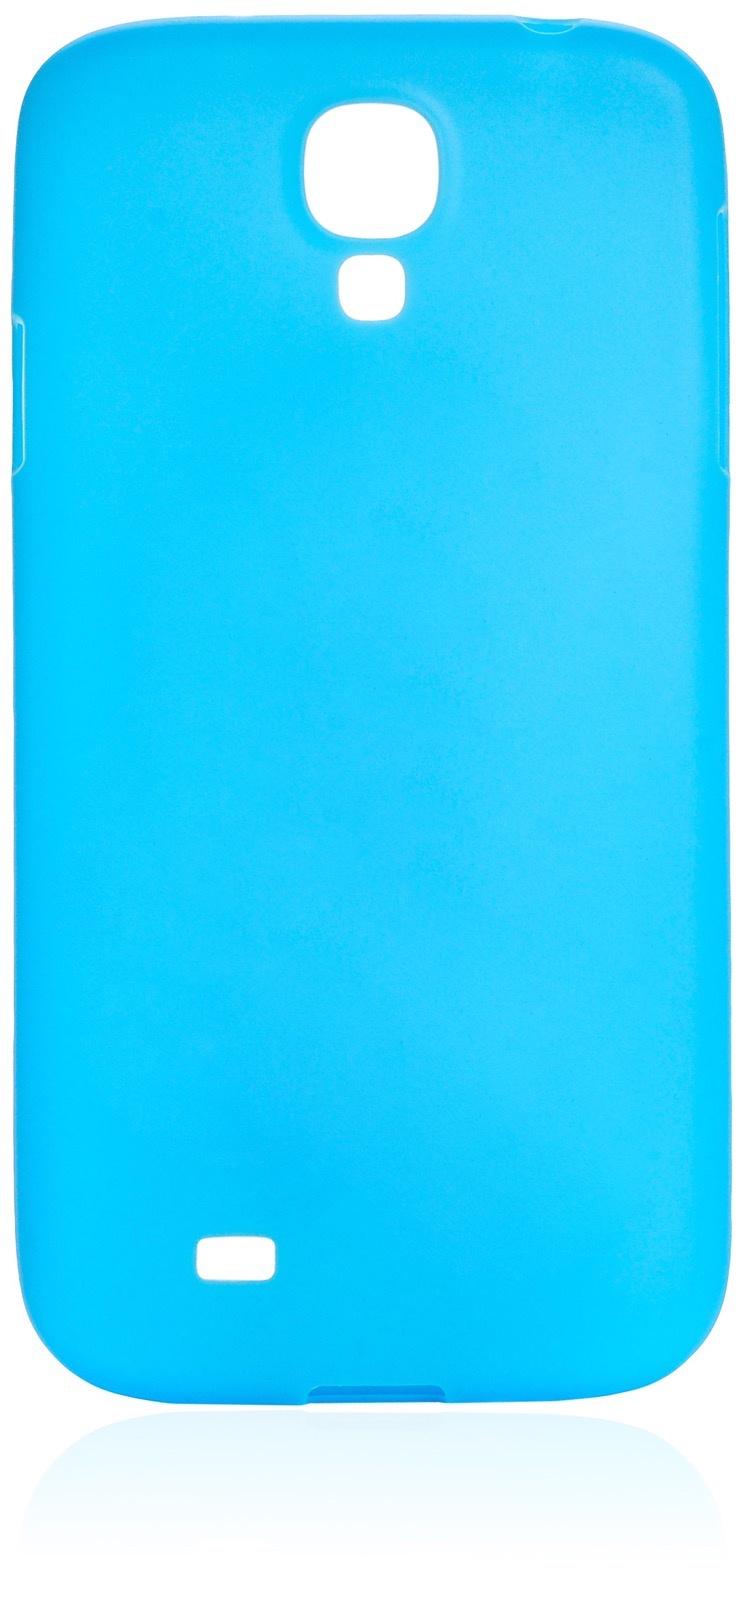 Чехол накладка iNeez Sipo силикон 450188 для Samsung Galaxy S4,450188,голубой